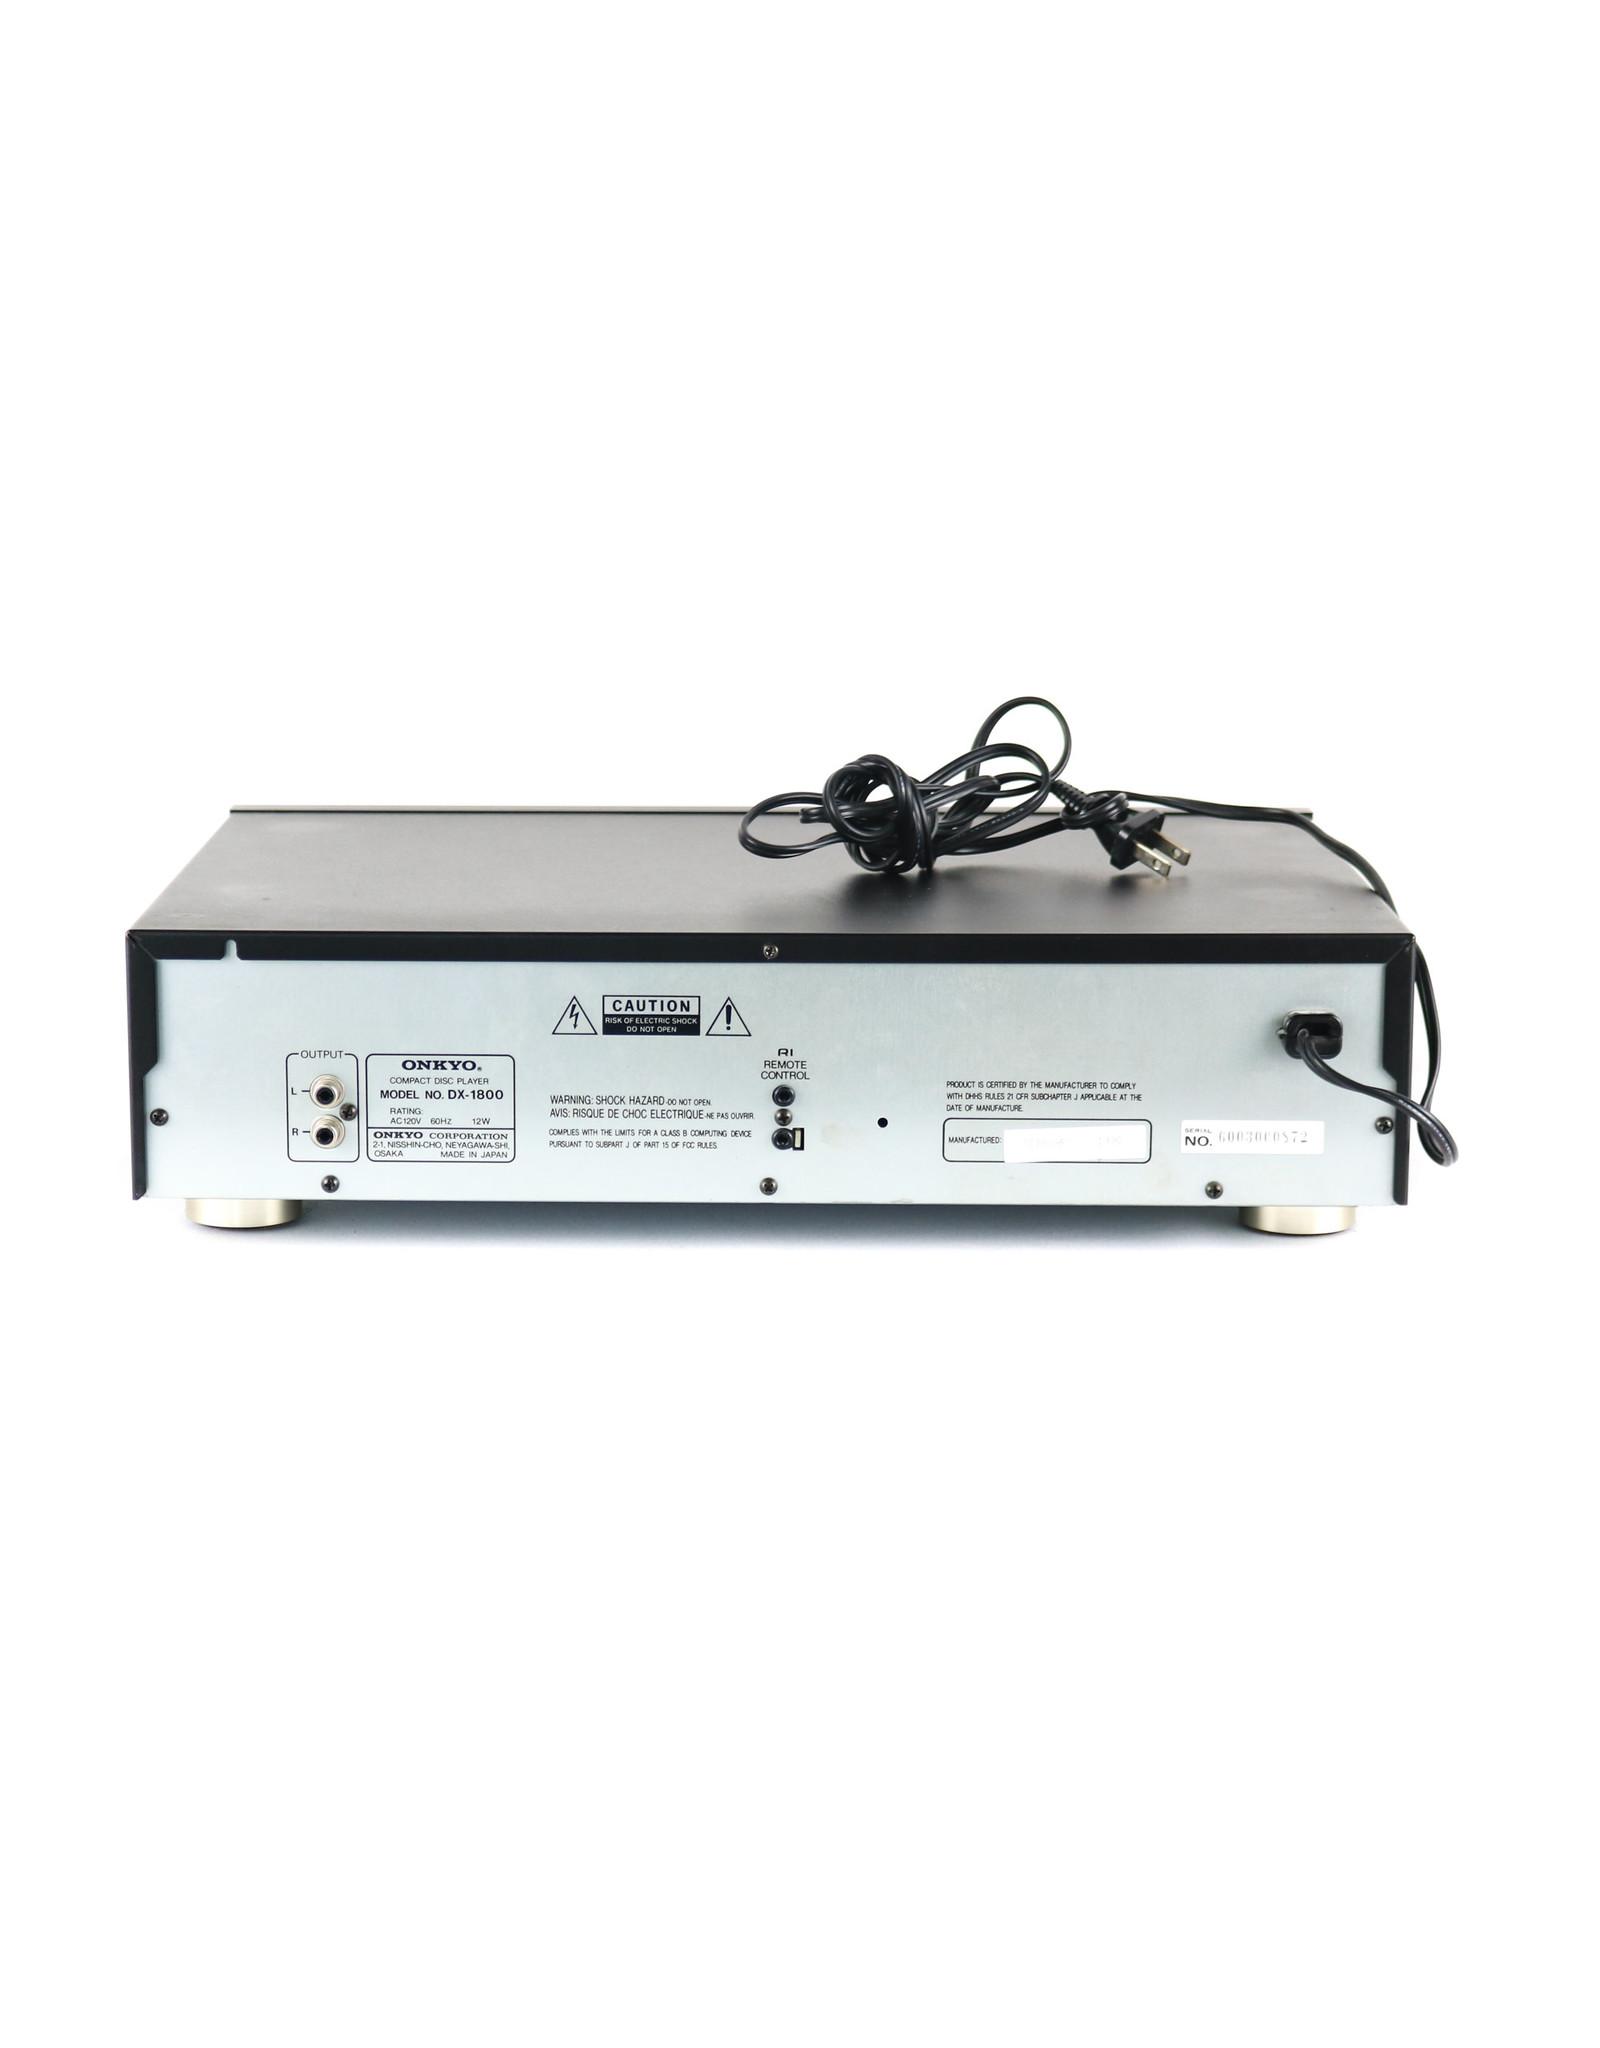 Onkyo Onkyo DX-1800 CD Player USED